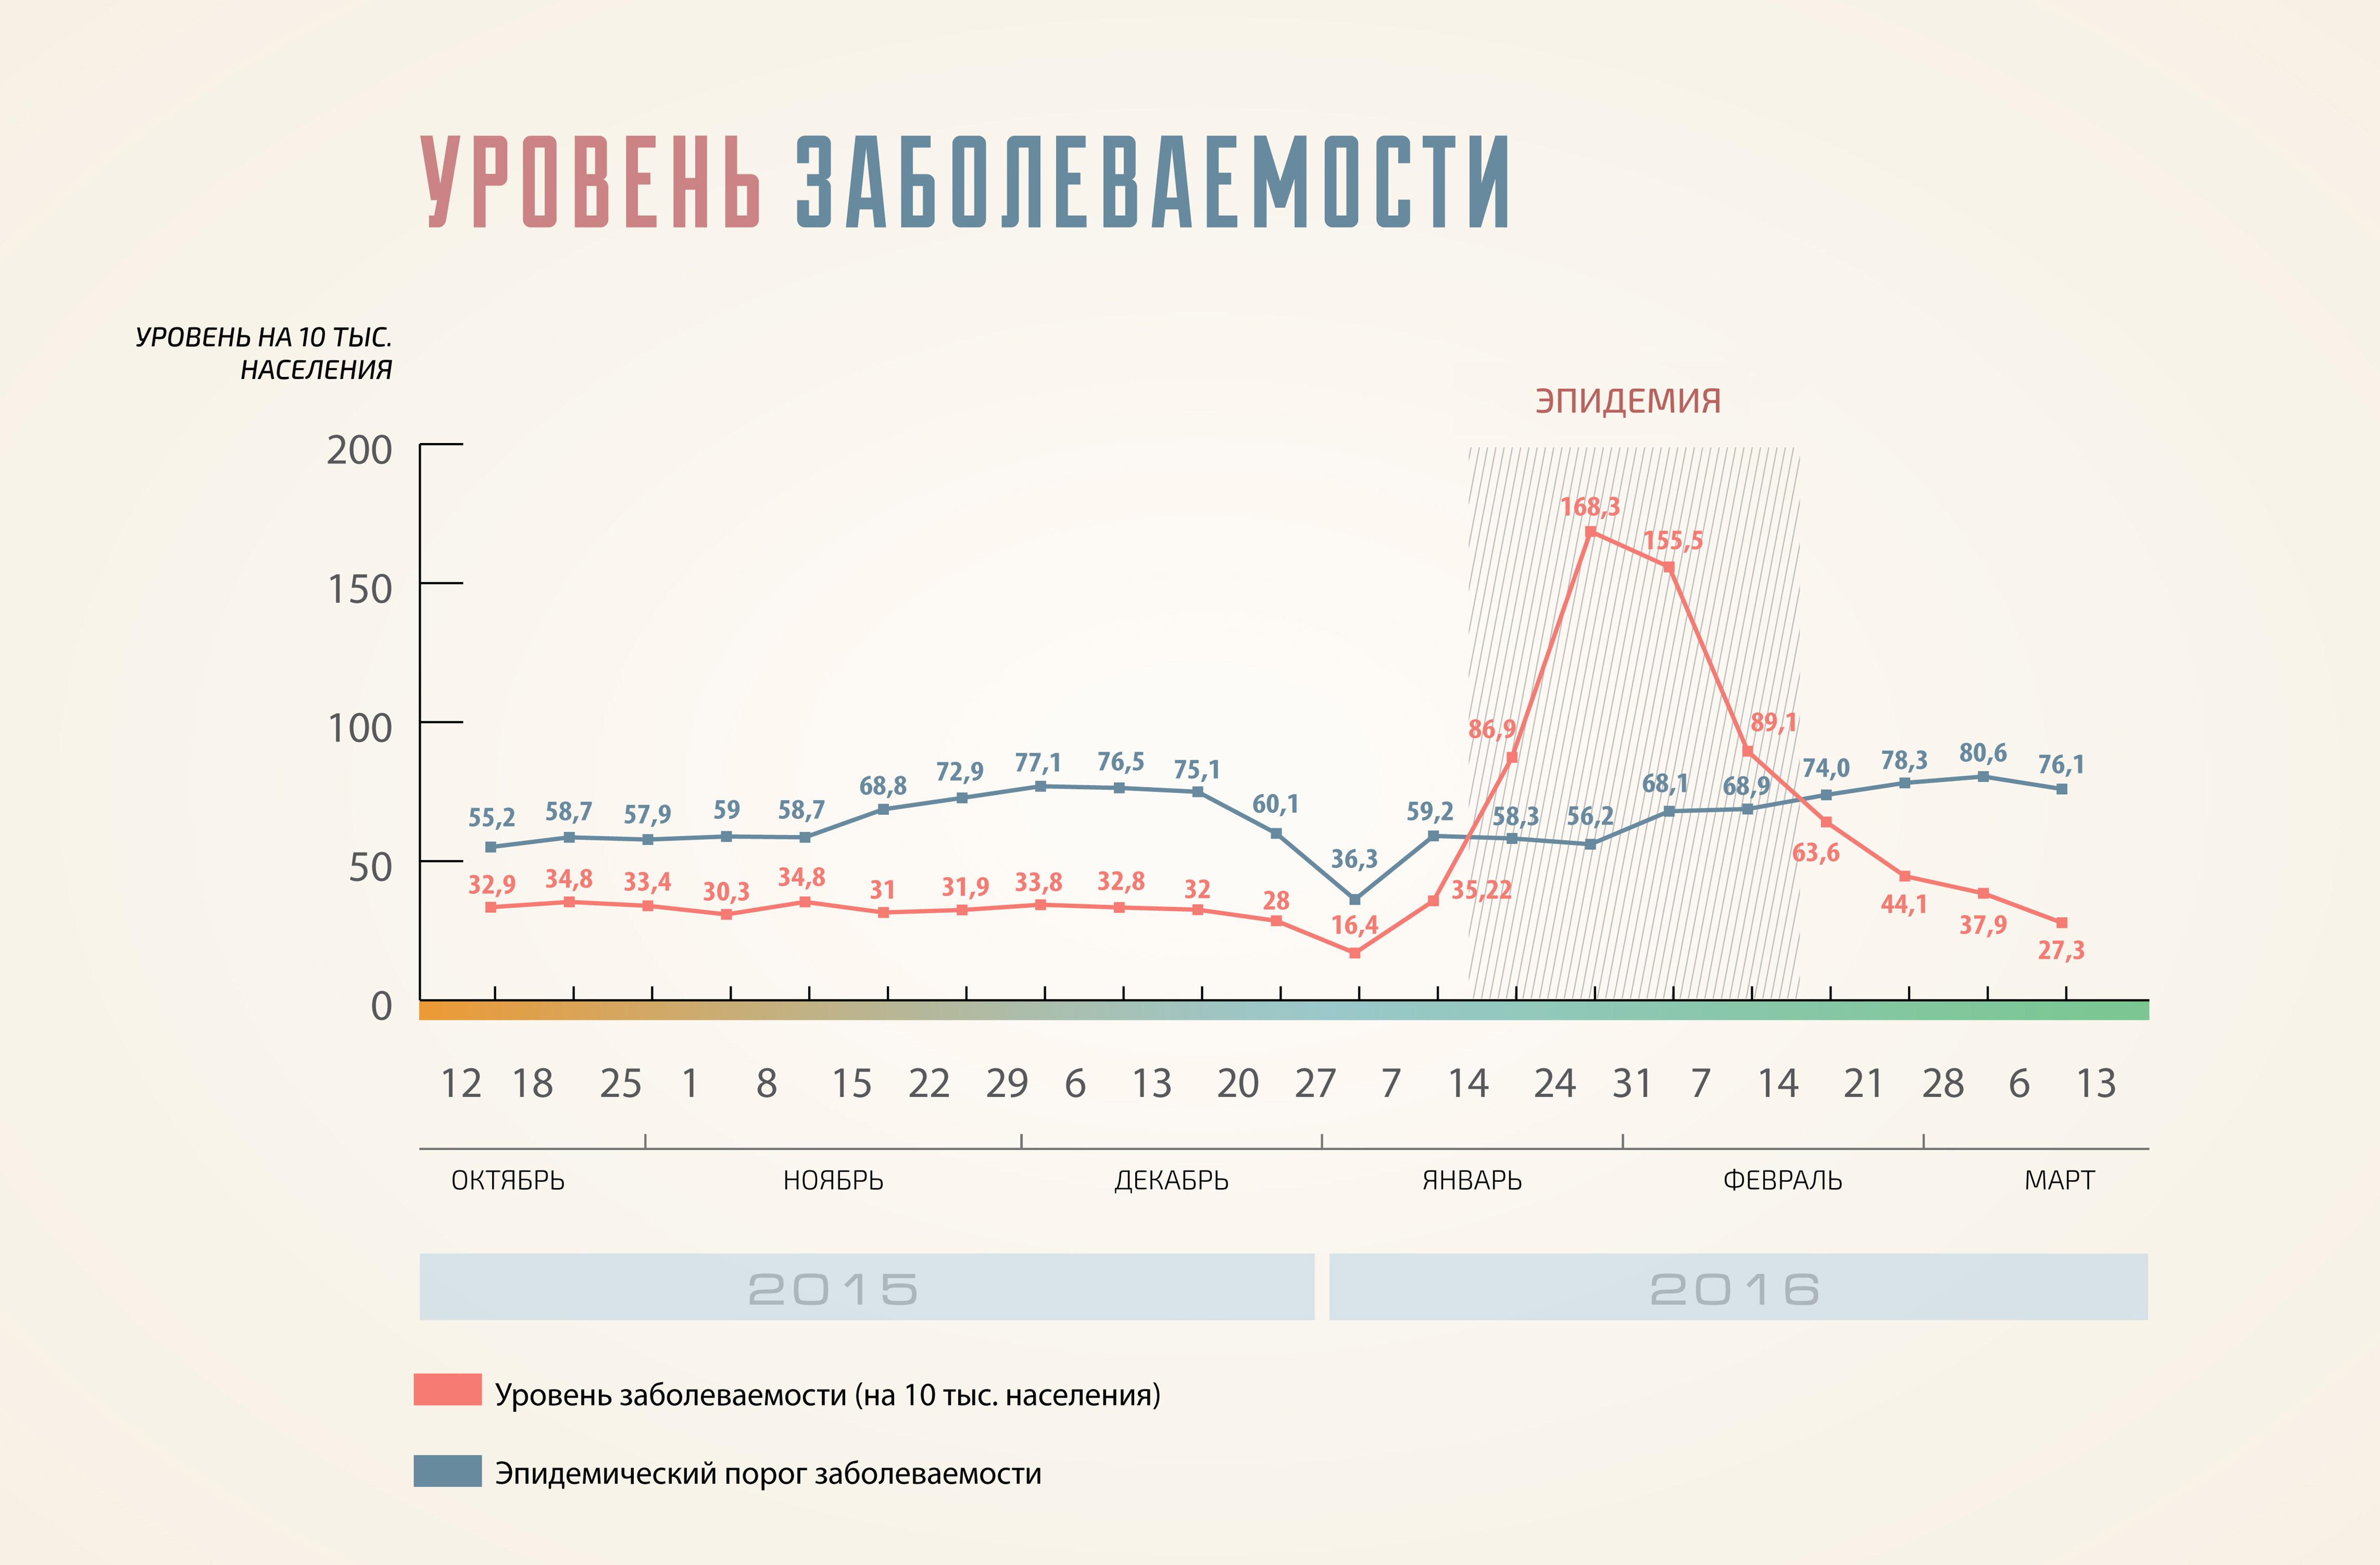 Ху из короновирус Ч1 https://mirbelogorya.ru/images/stories/news/2016/03/epidemioligical1.jpg